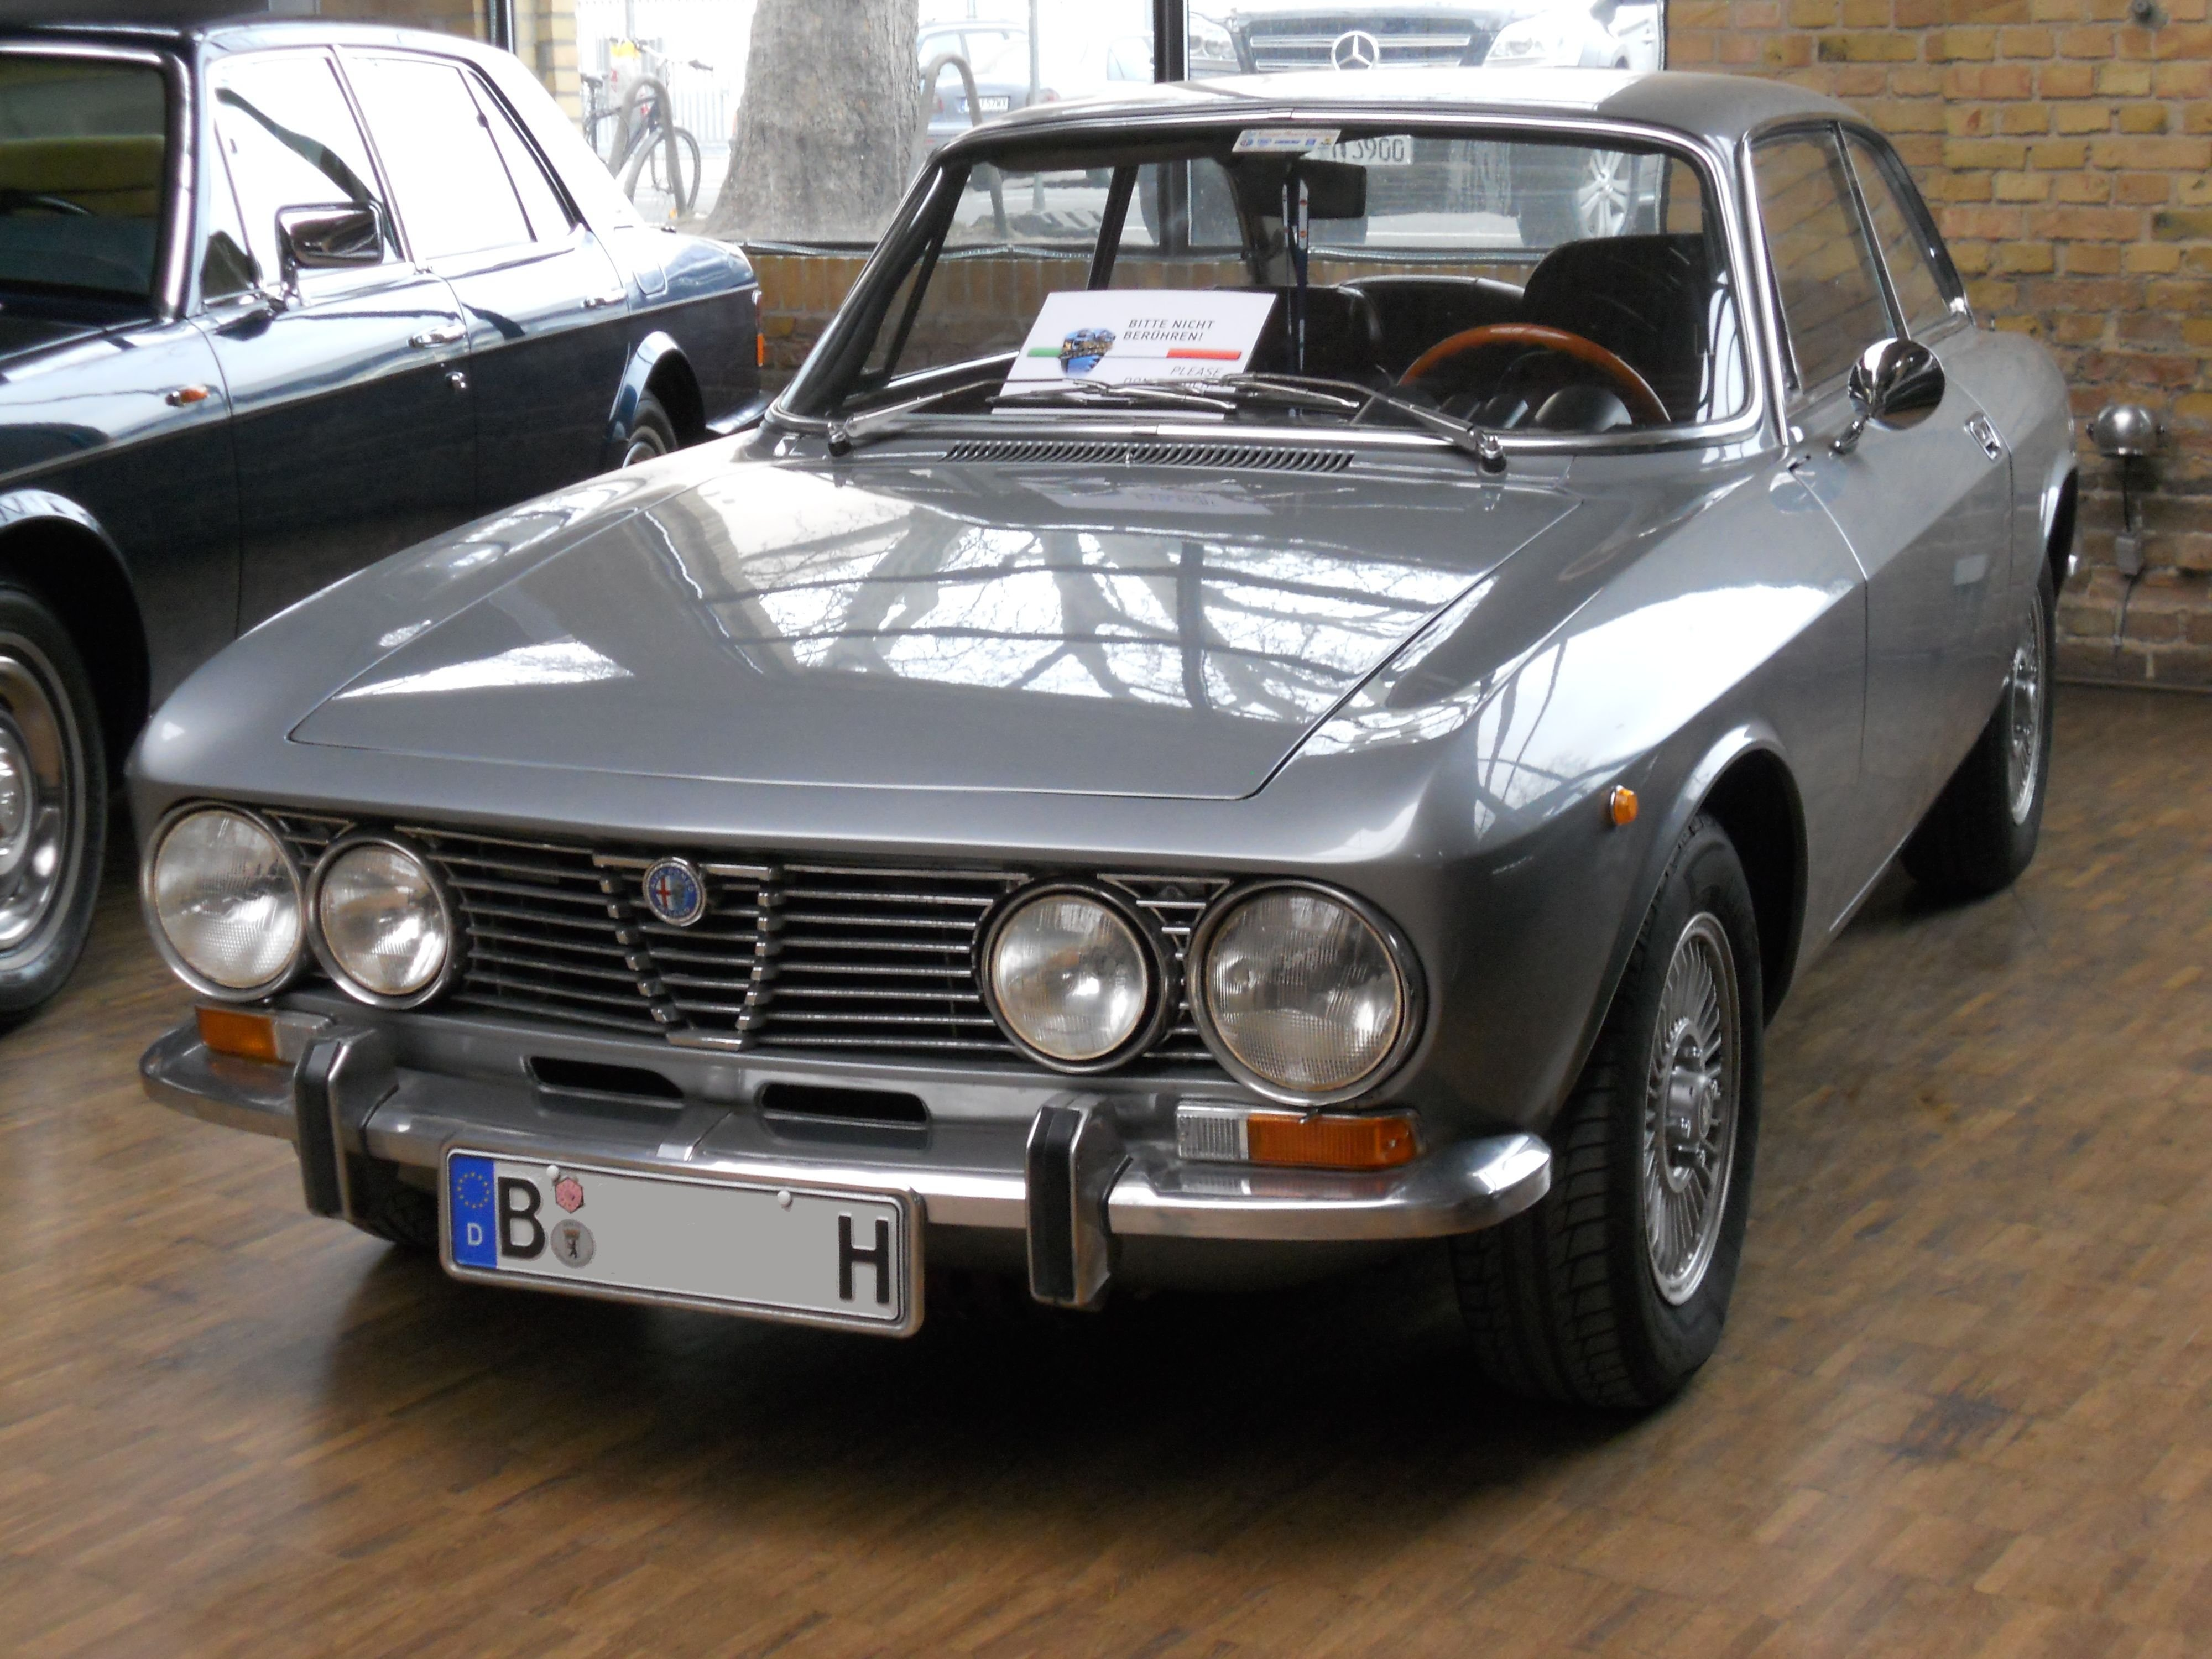 alfa romeo 2000 gtv bertone coupe classic cars 1970. Black Bedroom Furniture Sets. Home Design Ideas